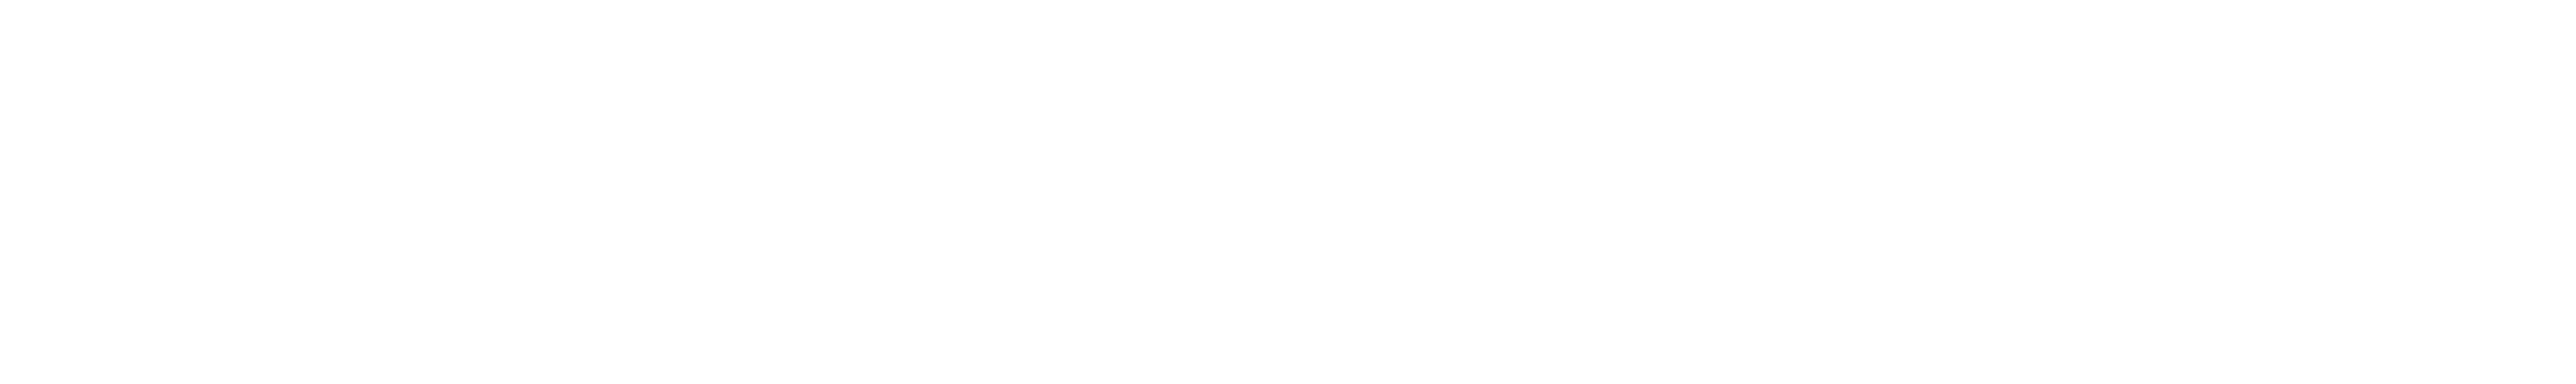 Centro Sant'Angelo Dott.ssa Maria Cocozza